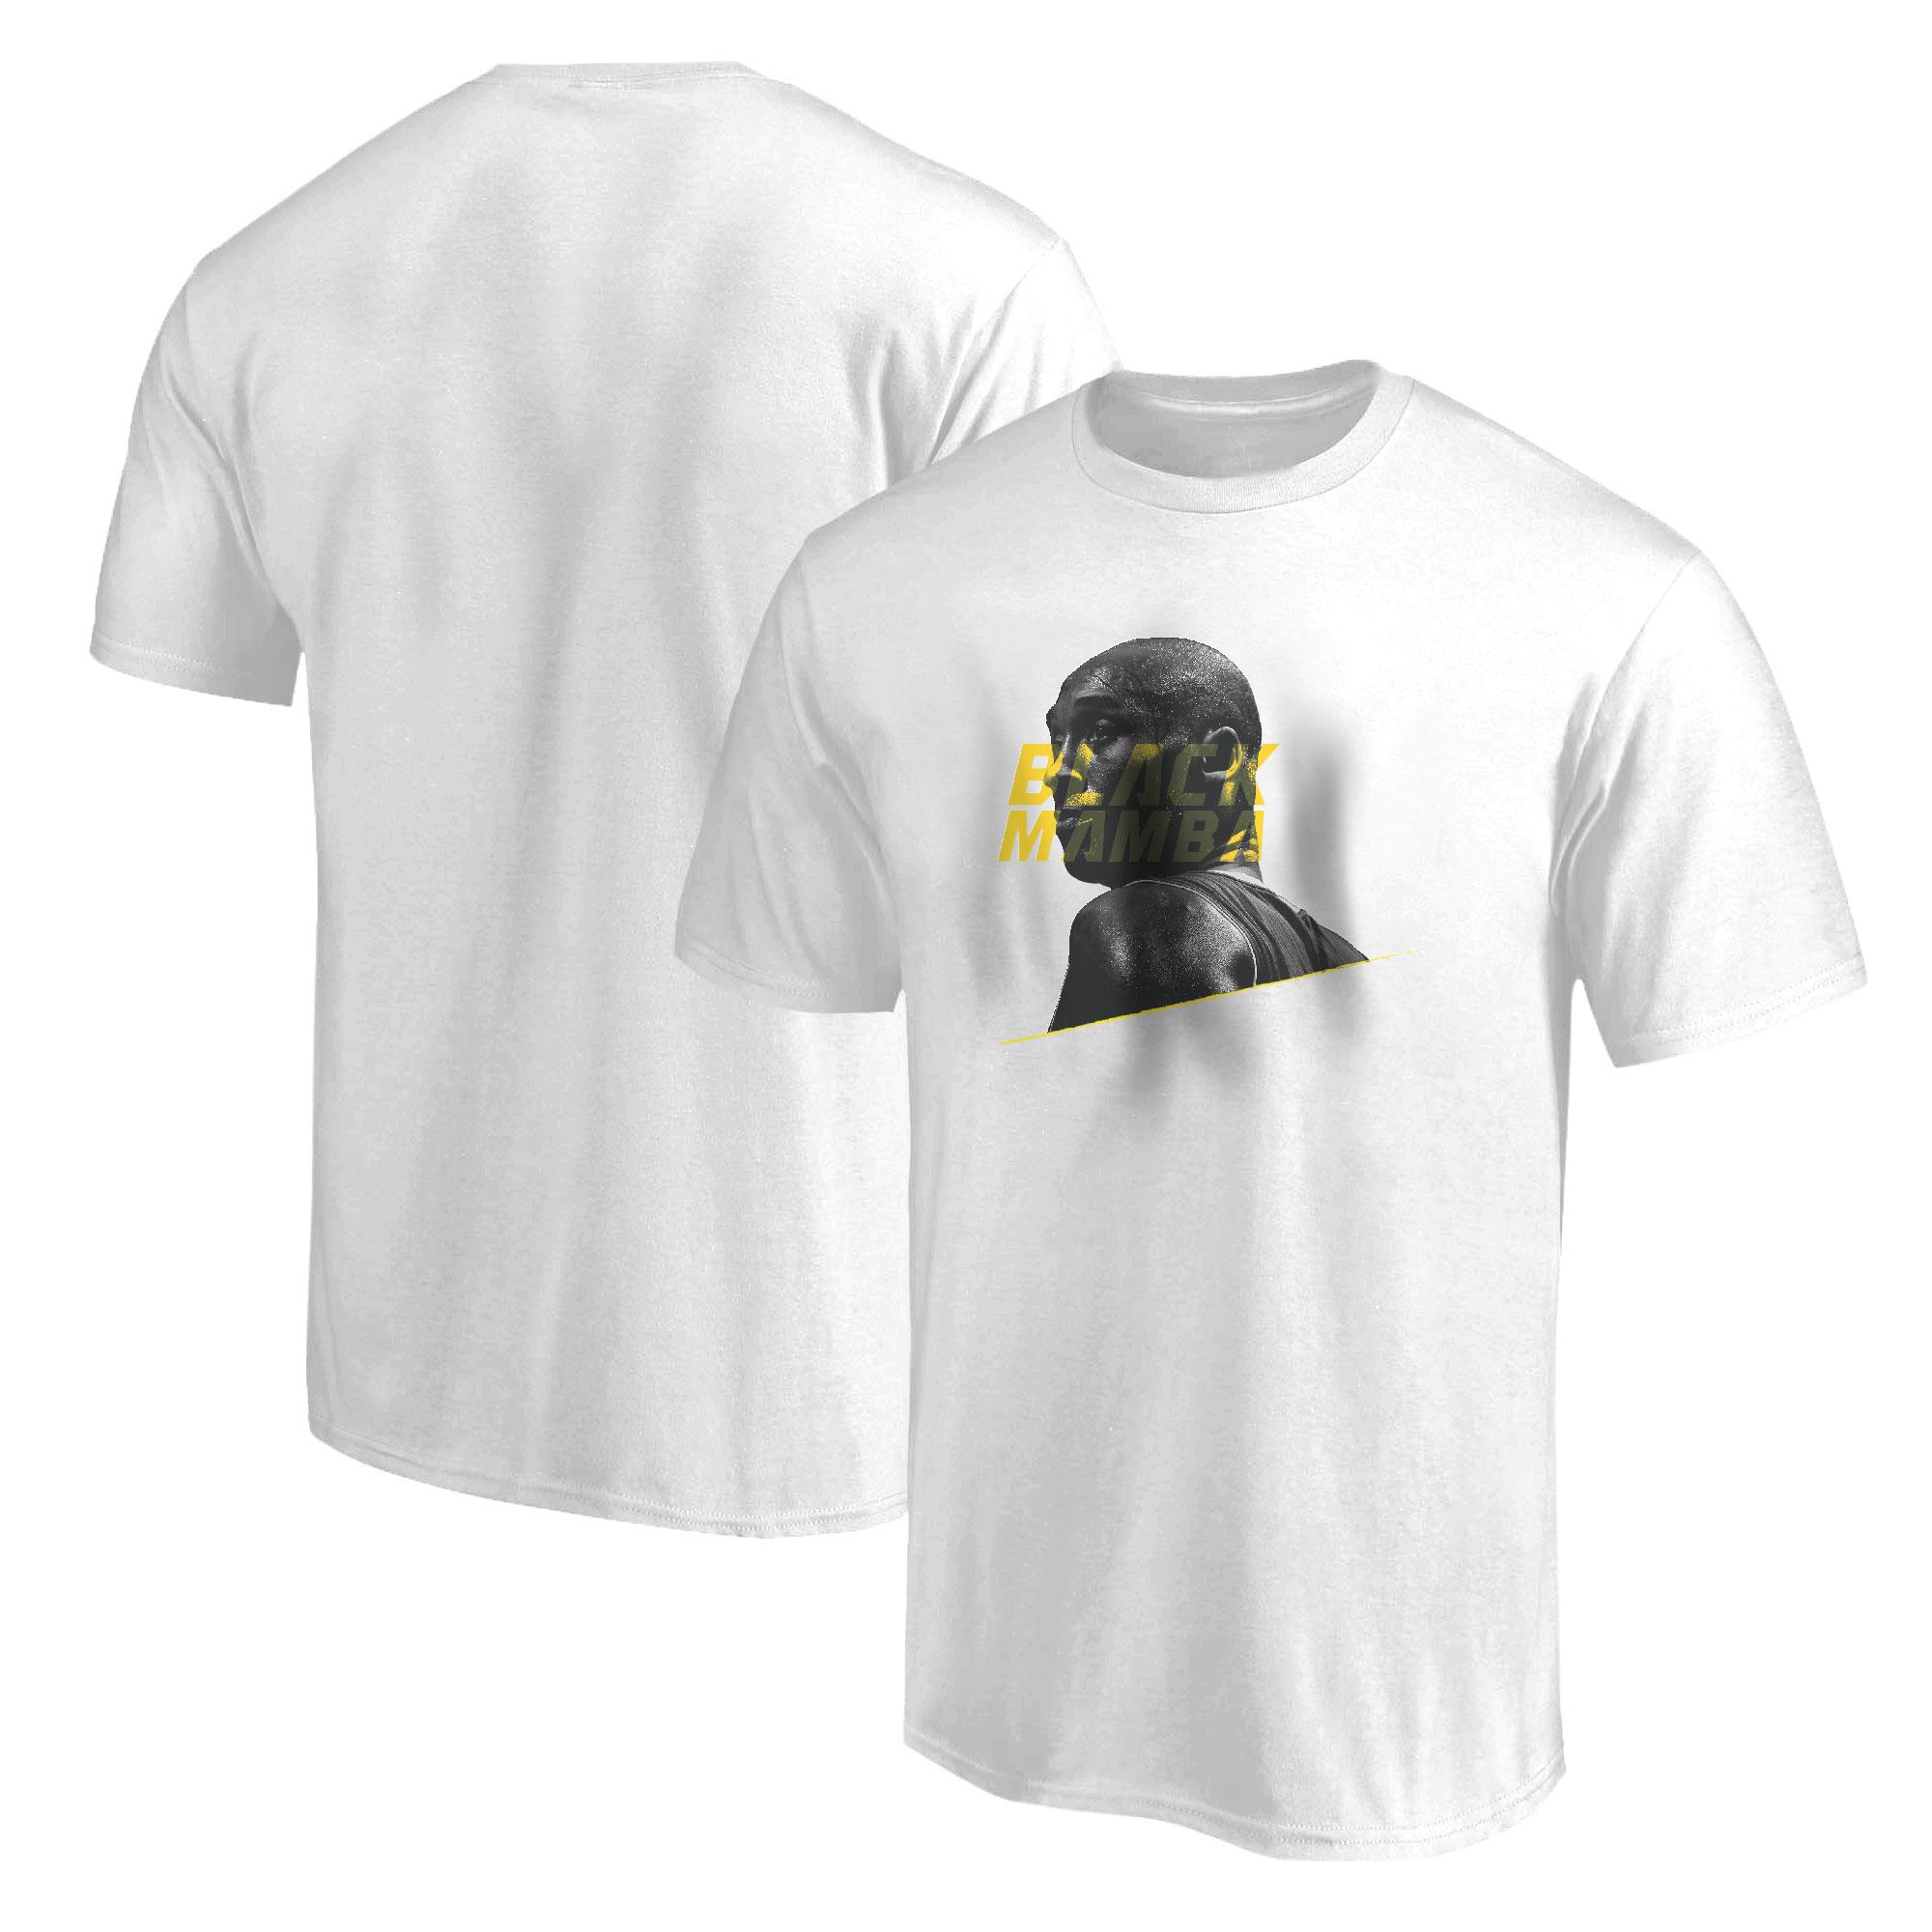 Kobe Bryant Tshirt (TSH-PRP-PLYR-477-BLACK.MAMBA)